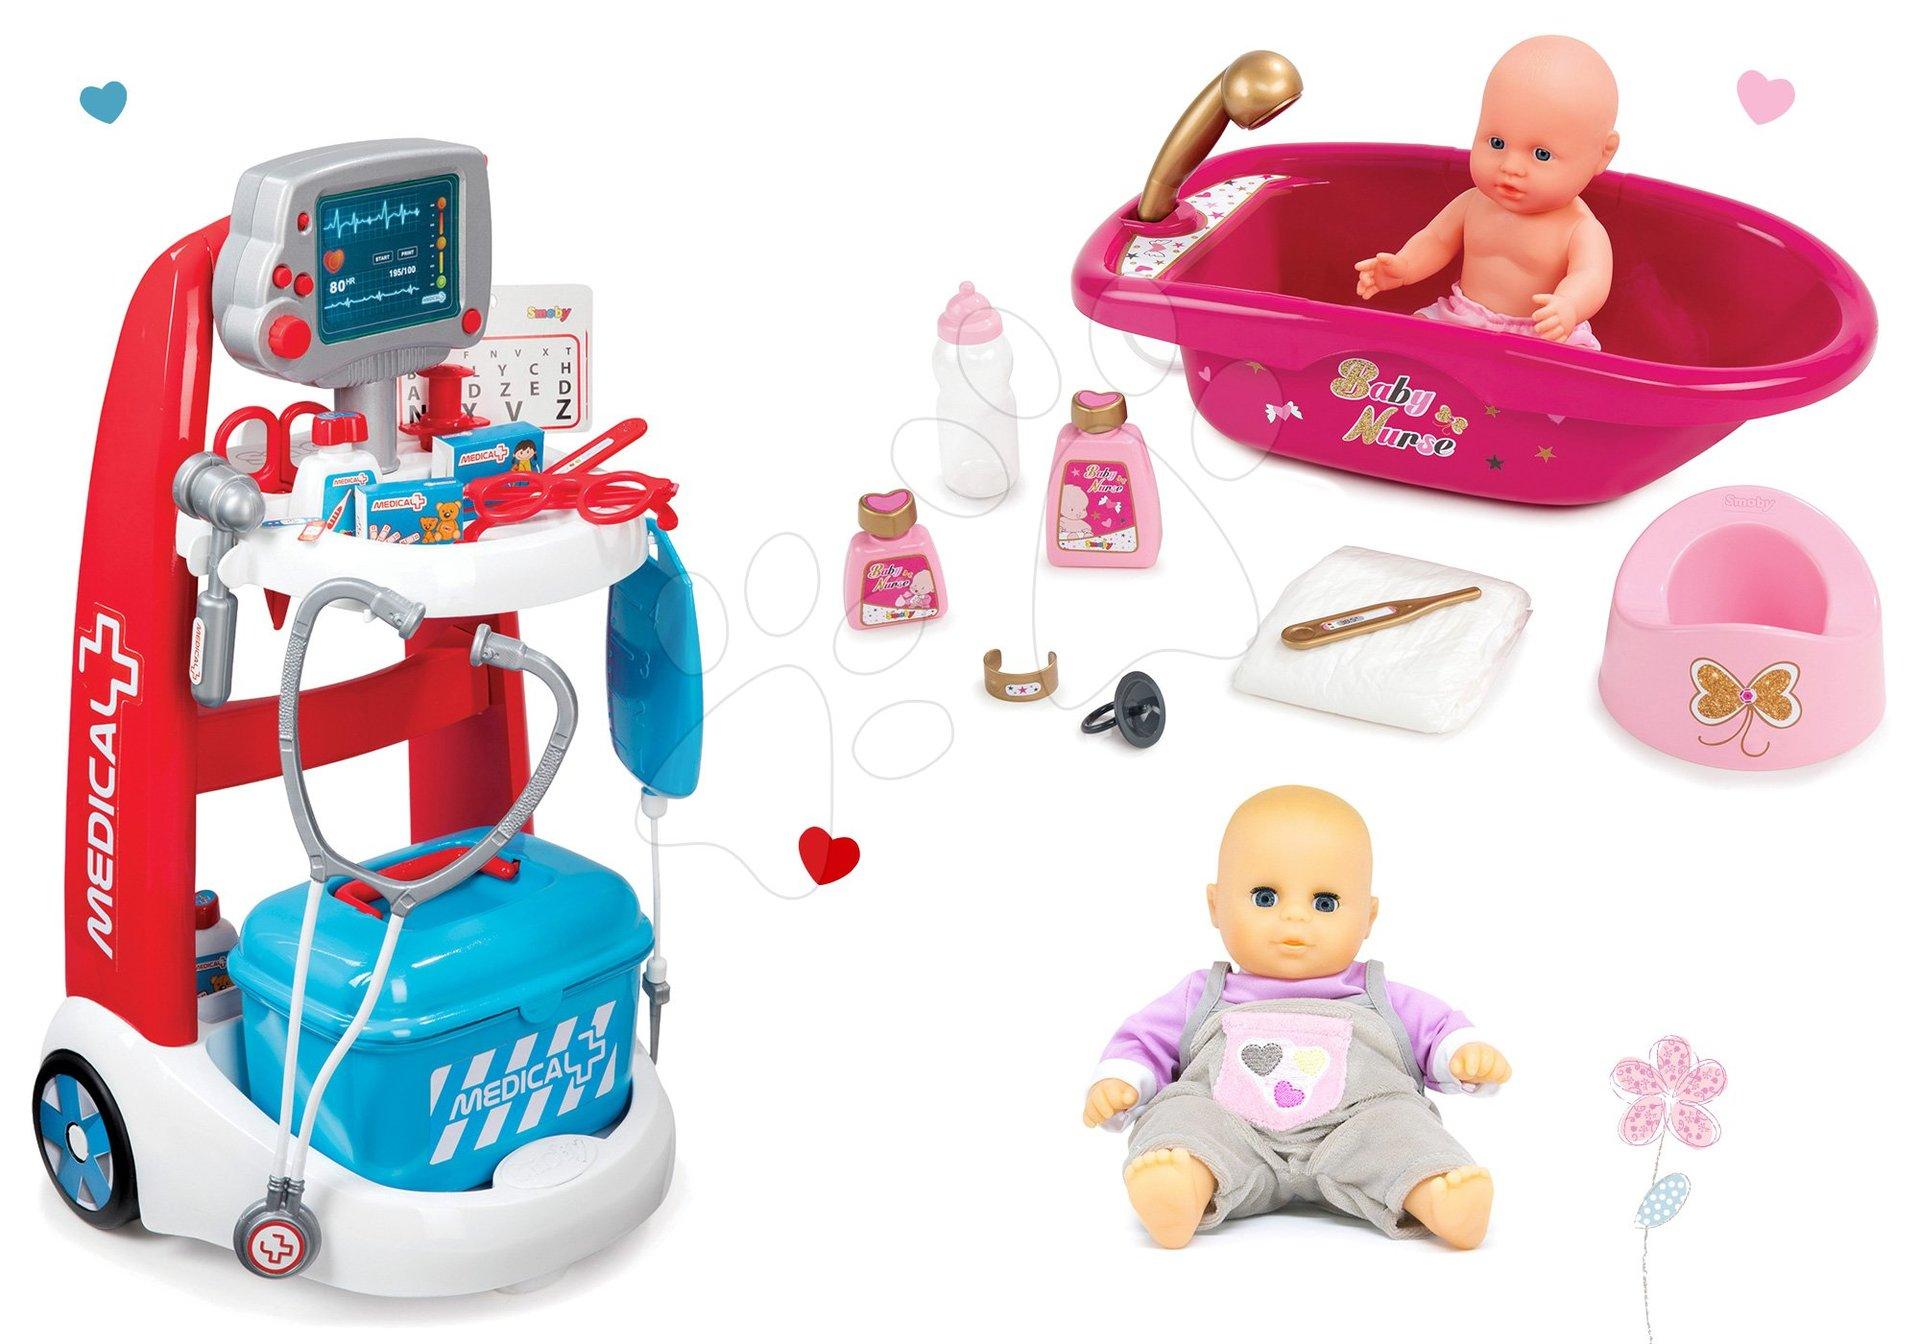 Set lekársky vozík elektronický Medical Smoby a vanička s bábikou a doplnkami